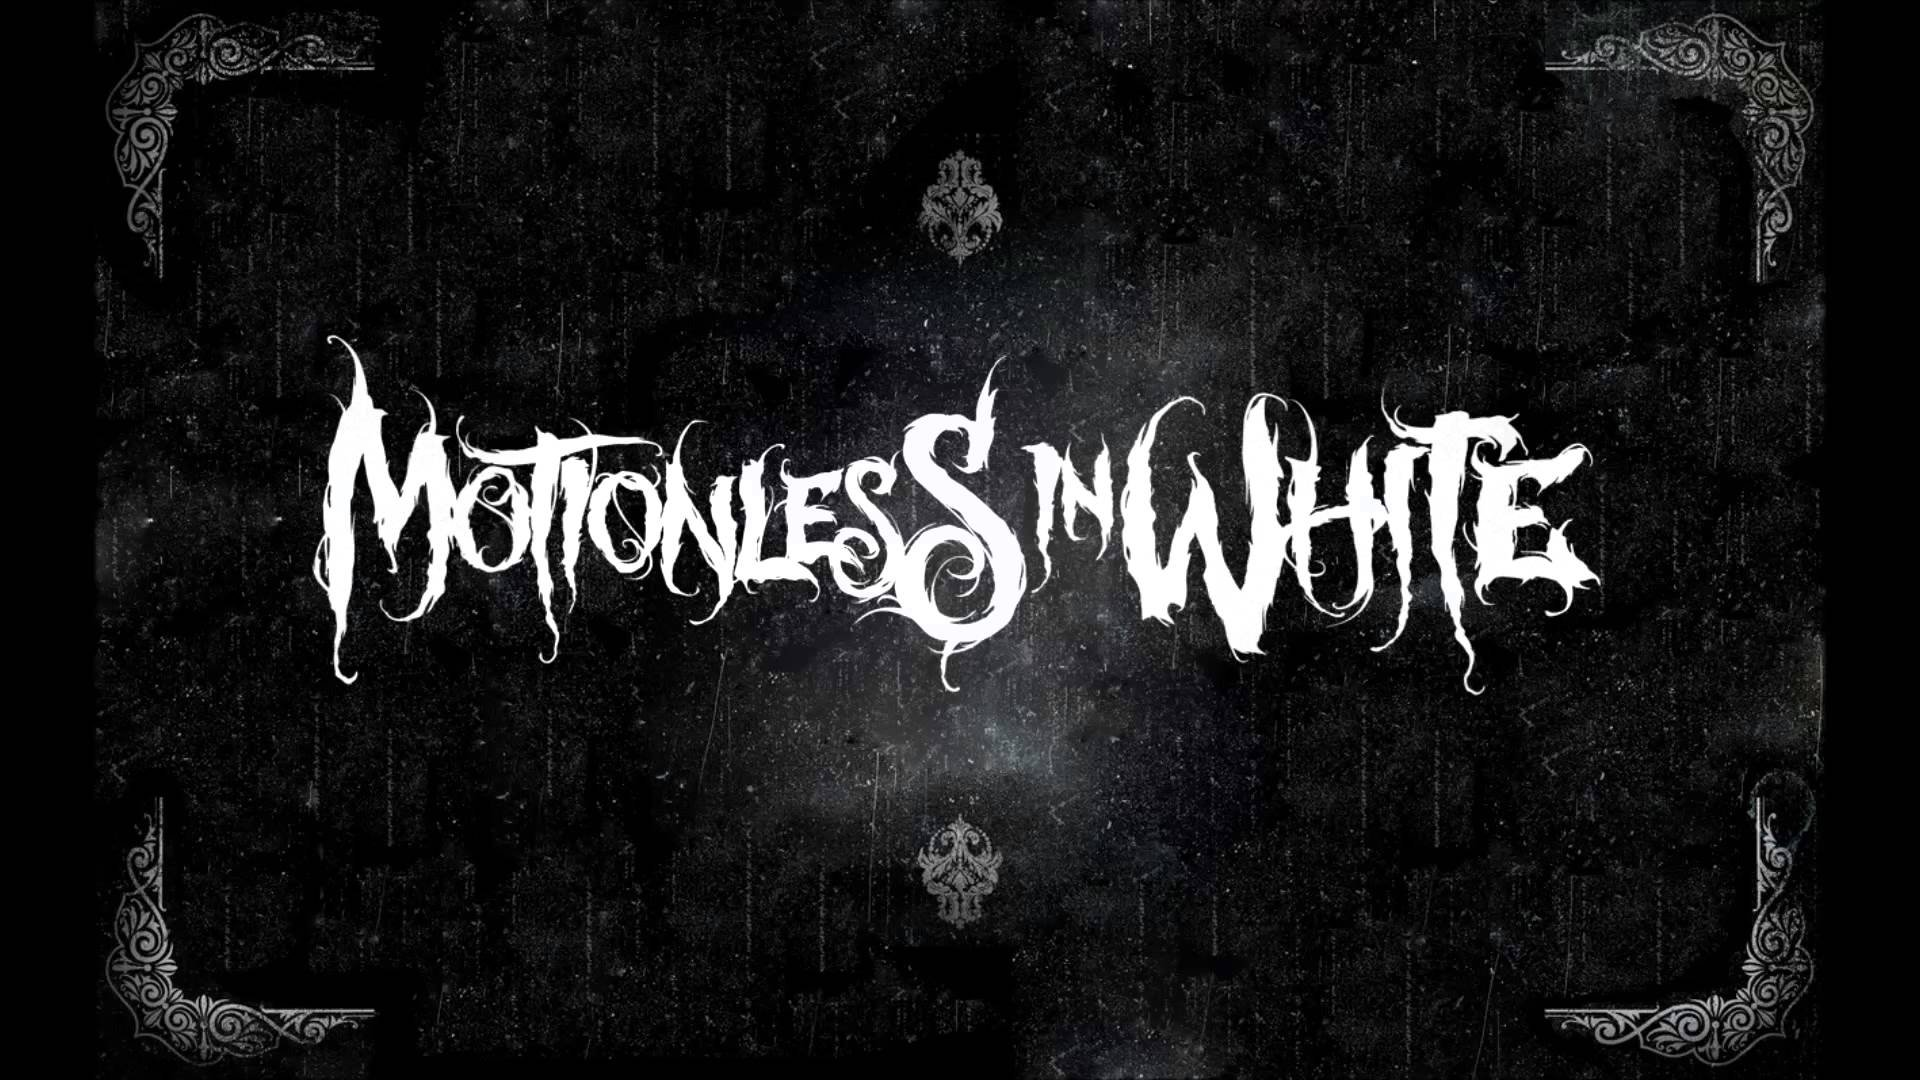 motionless in white metalcore heavy metal hard rock 1miw